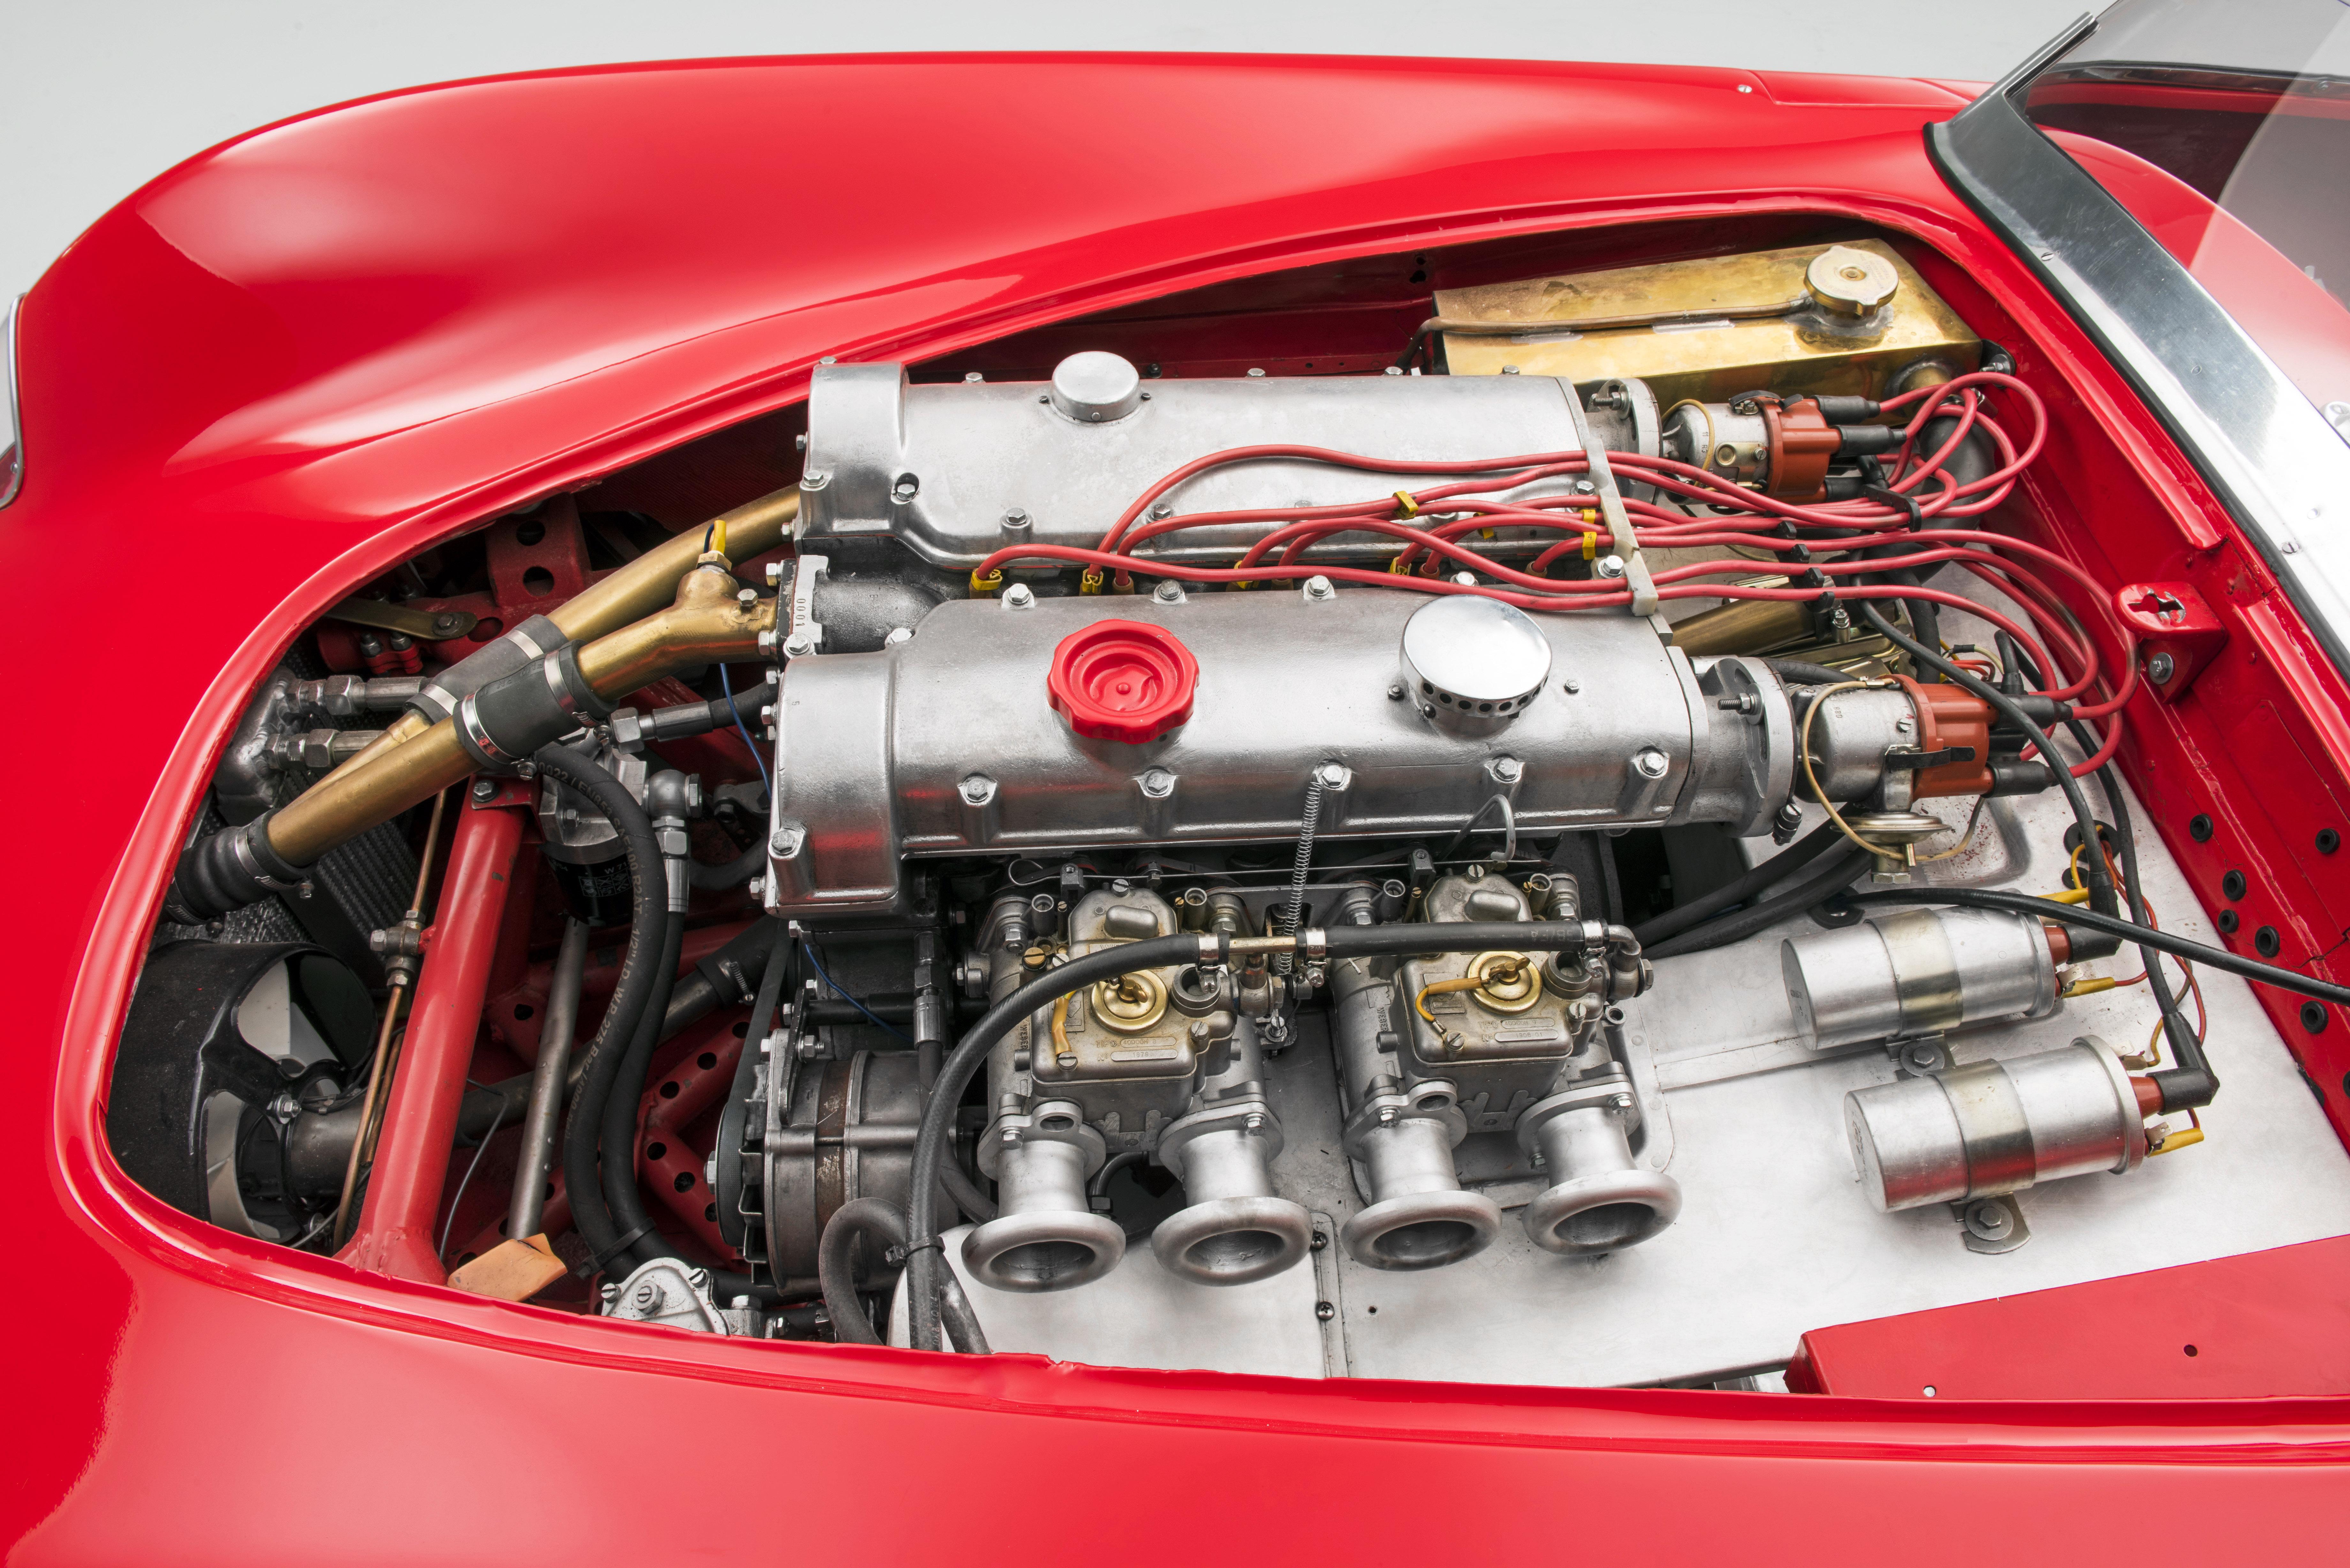 SKODA 1100 OHC (1957): The beautiful dream of Le Mans - Image 2